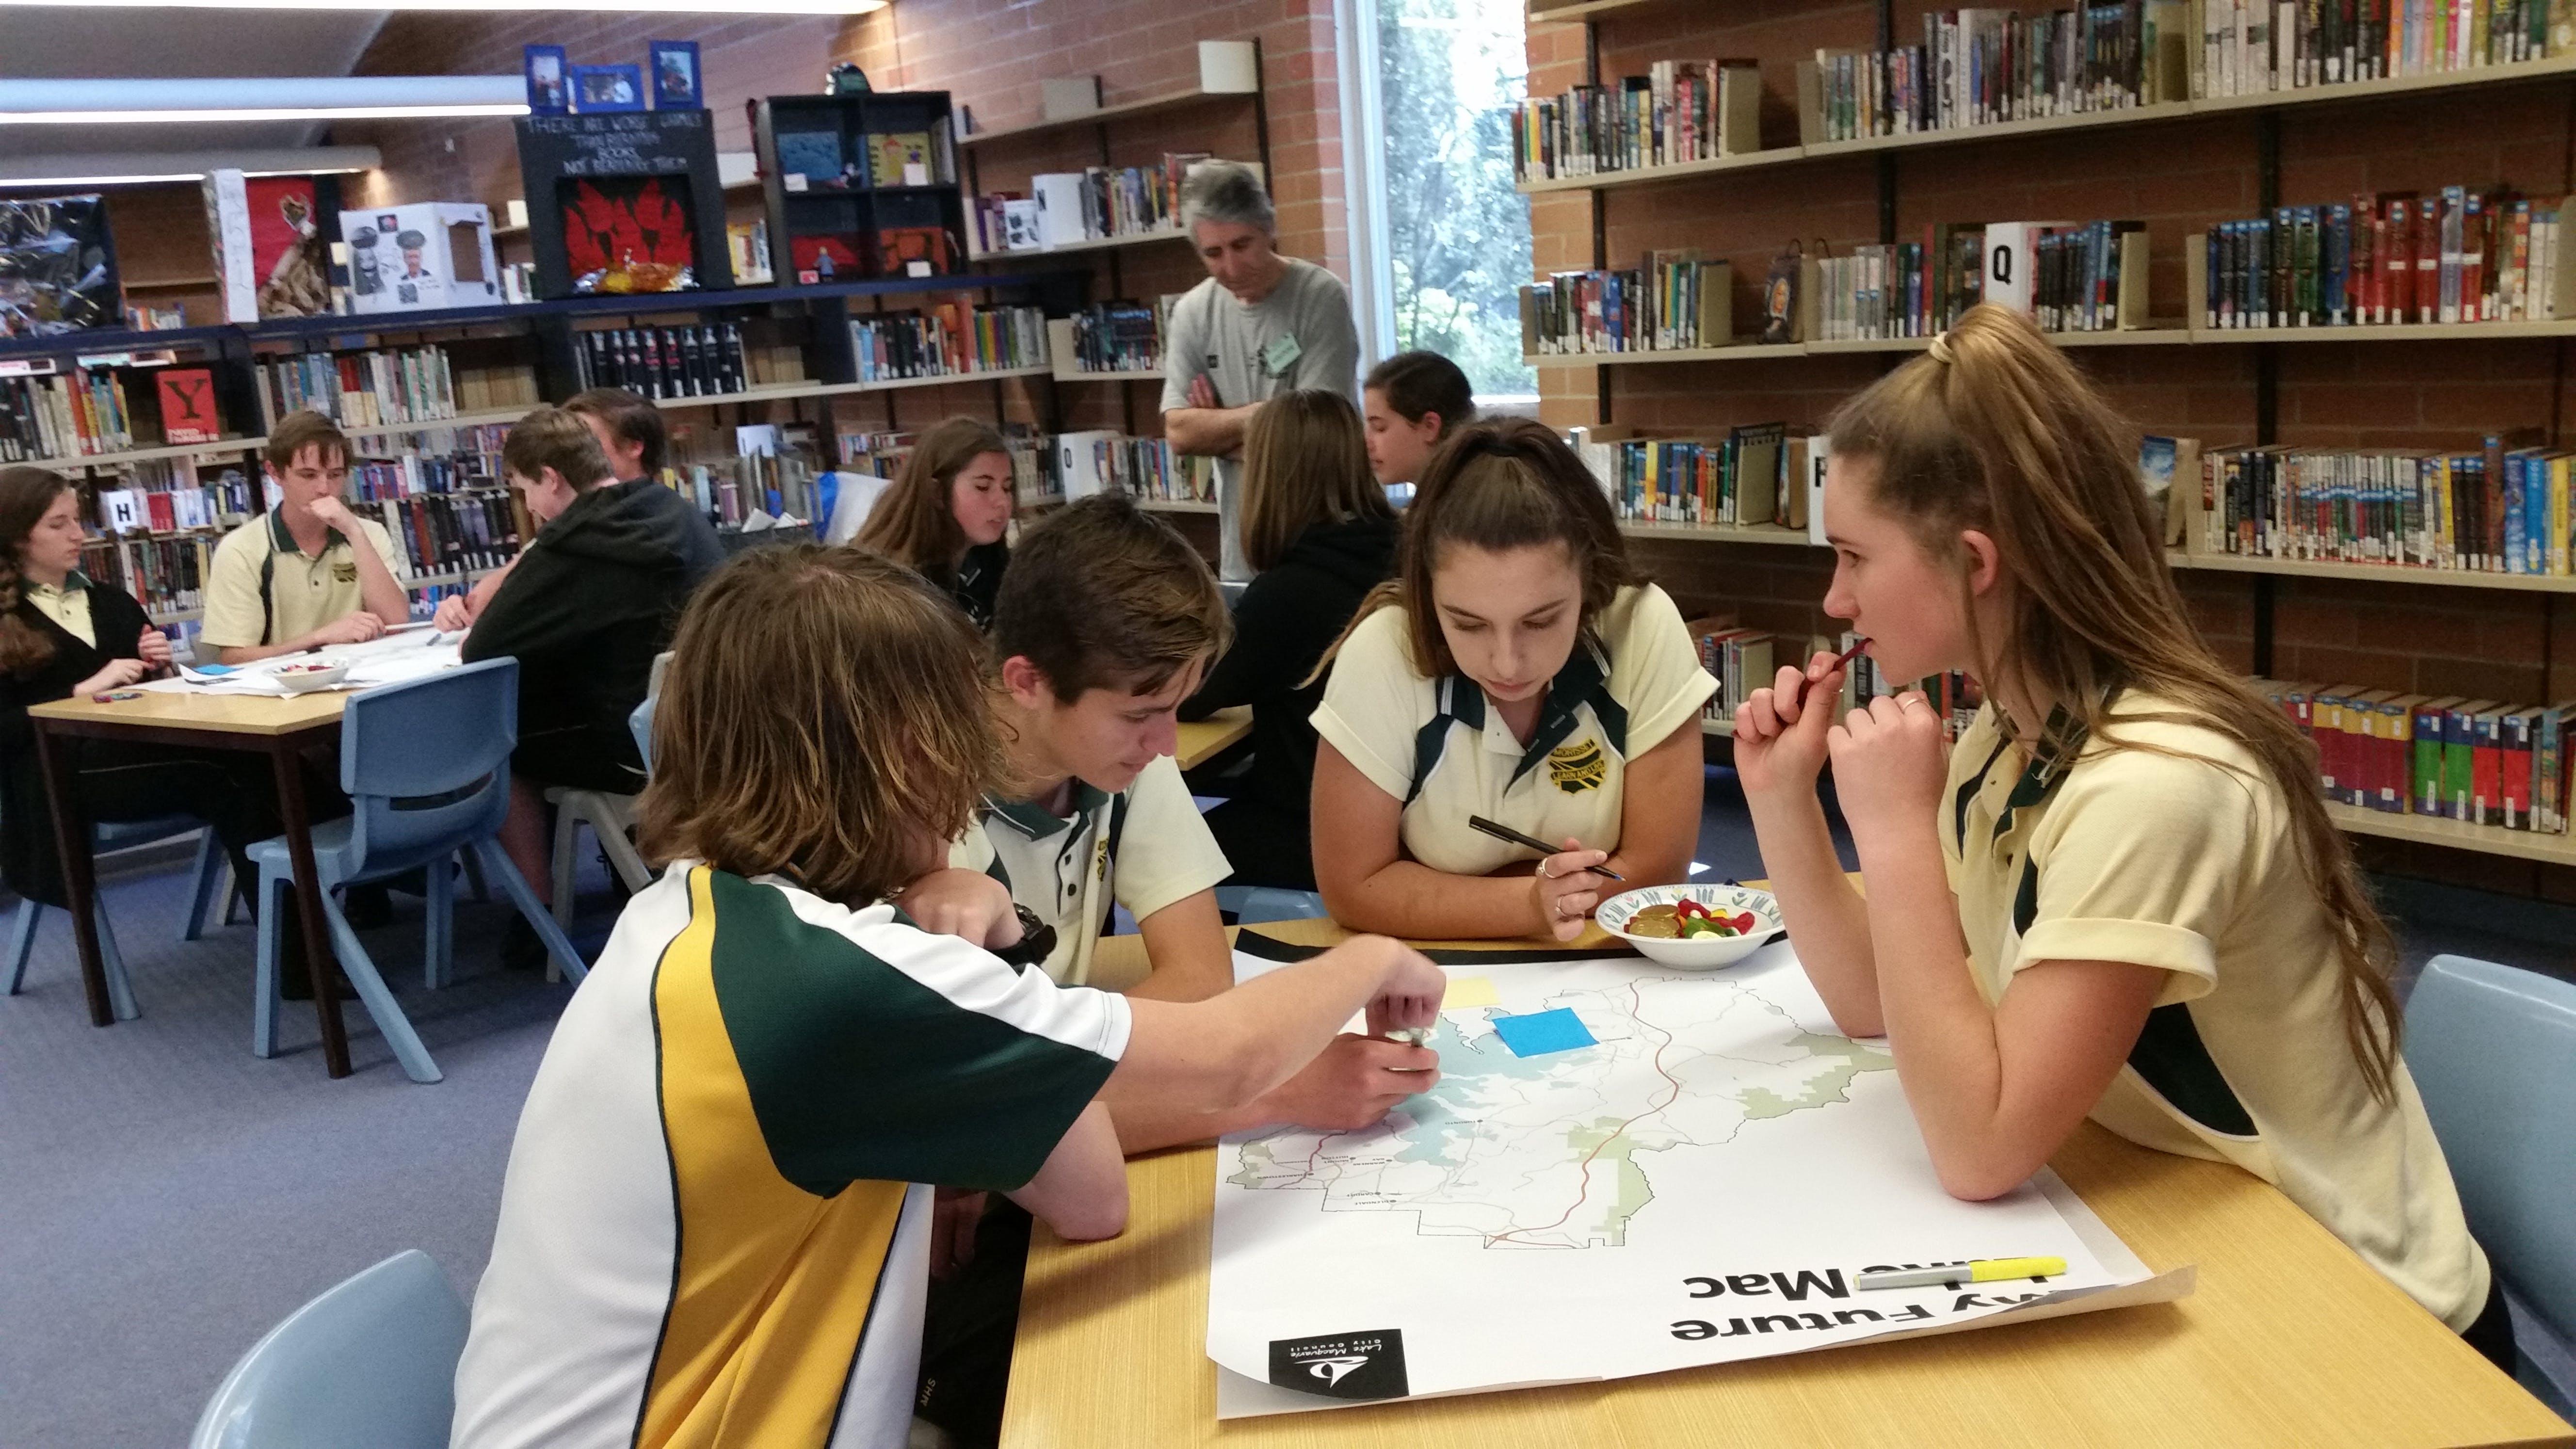 Morisset High School planning workshop gets serious